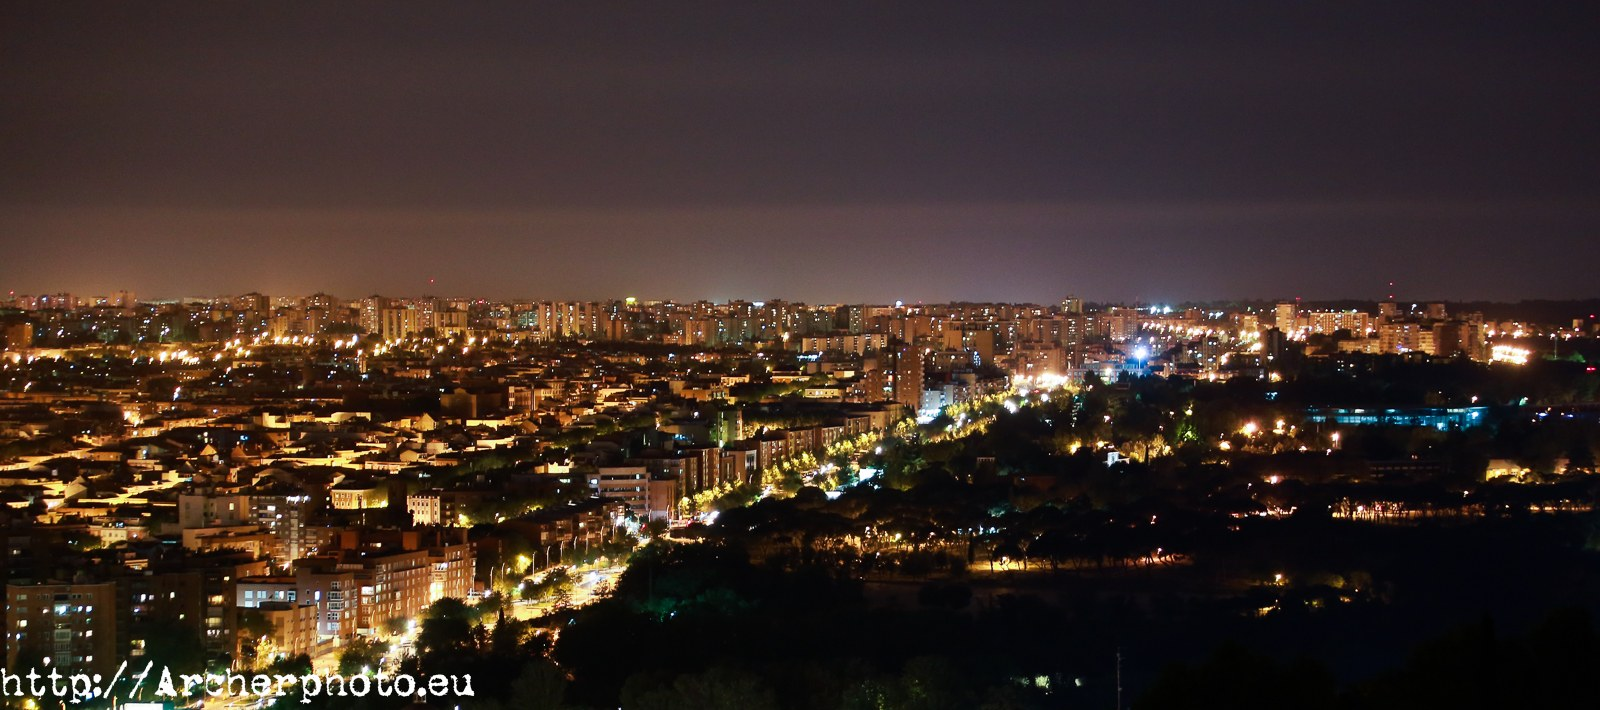 Madrid, foto nocturna